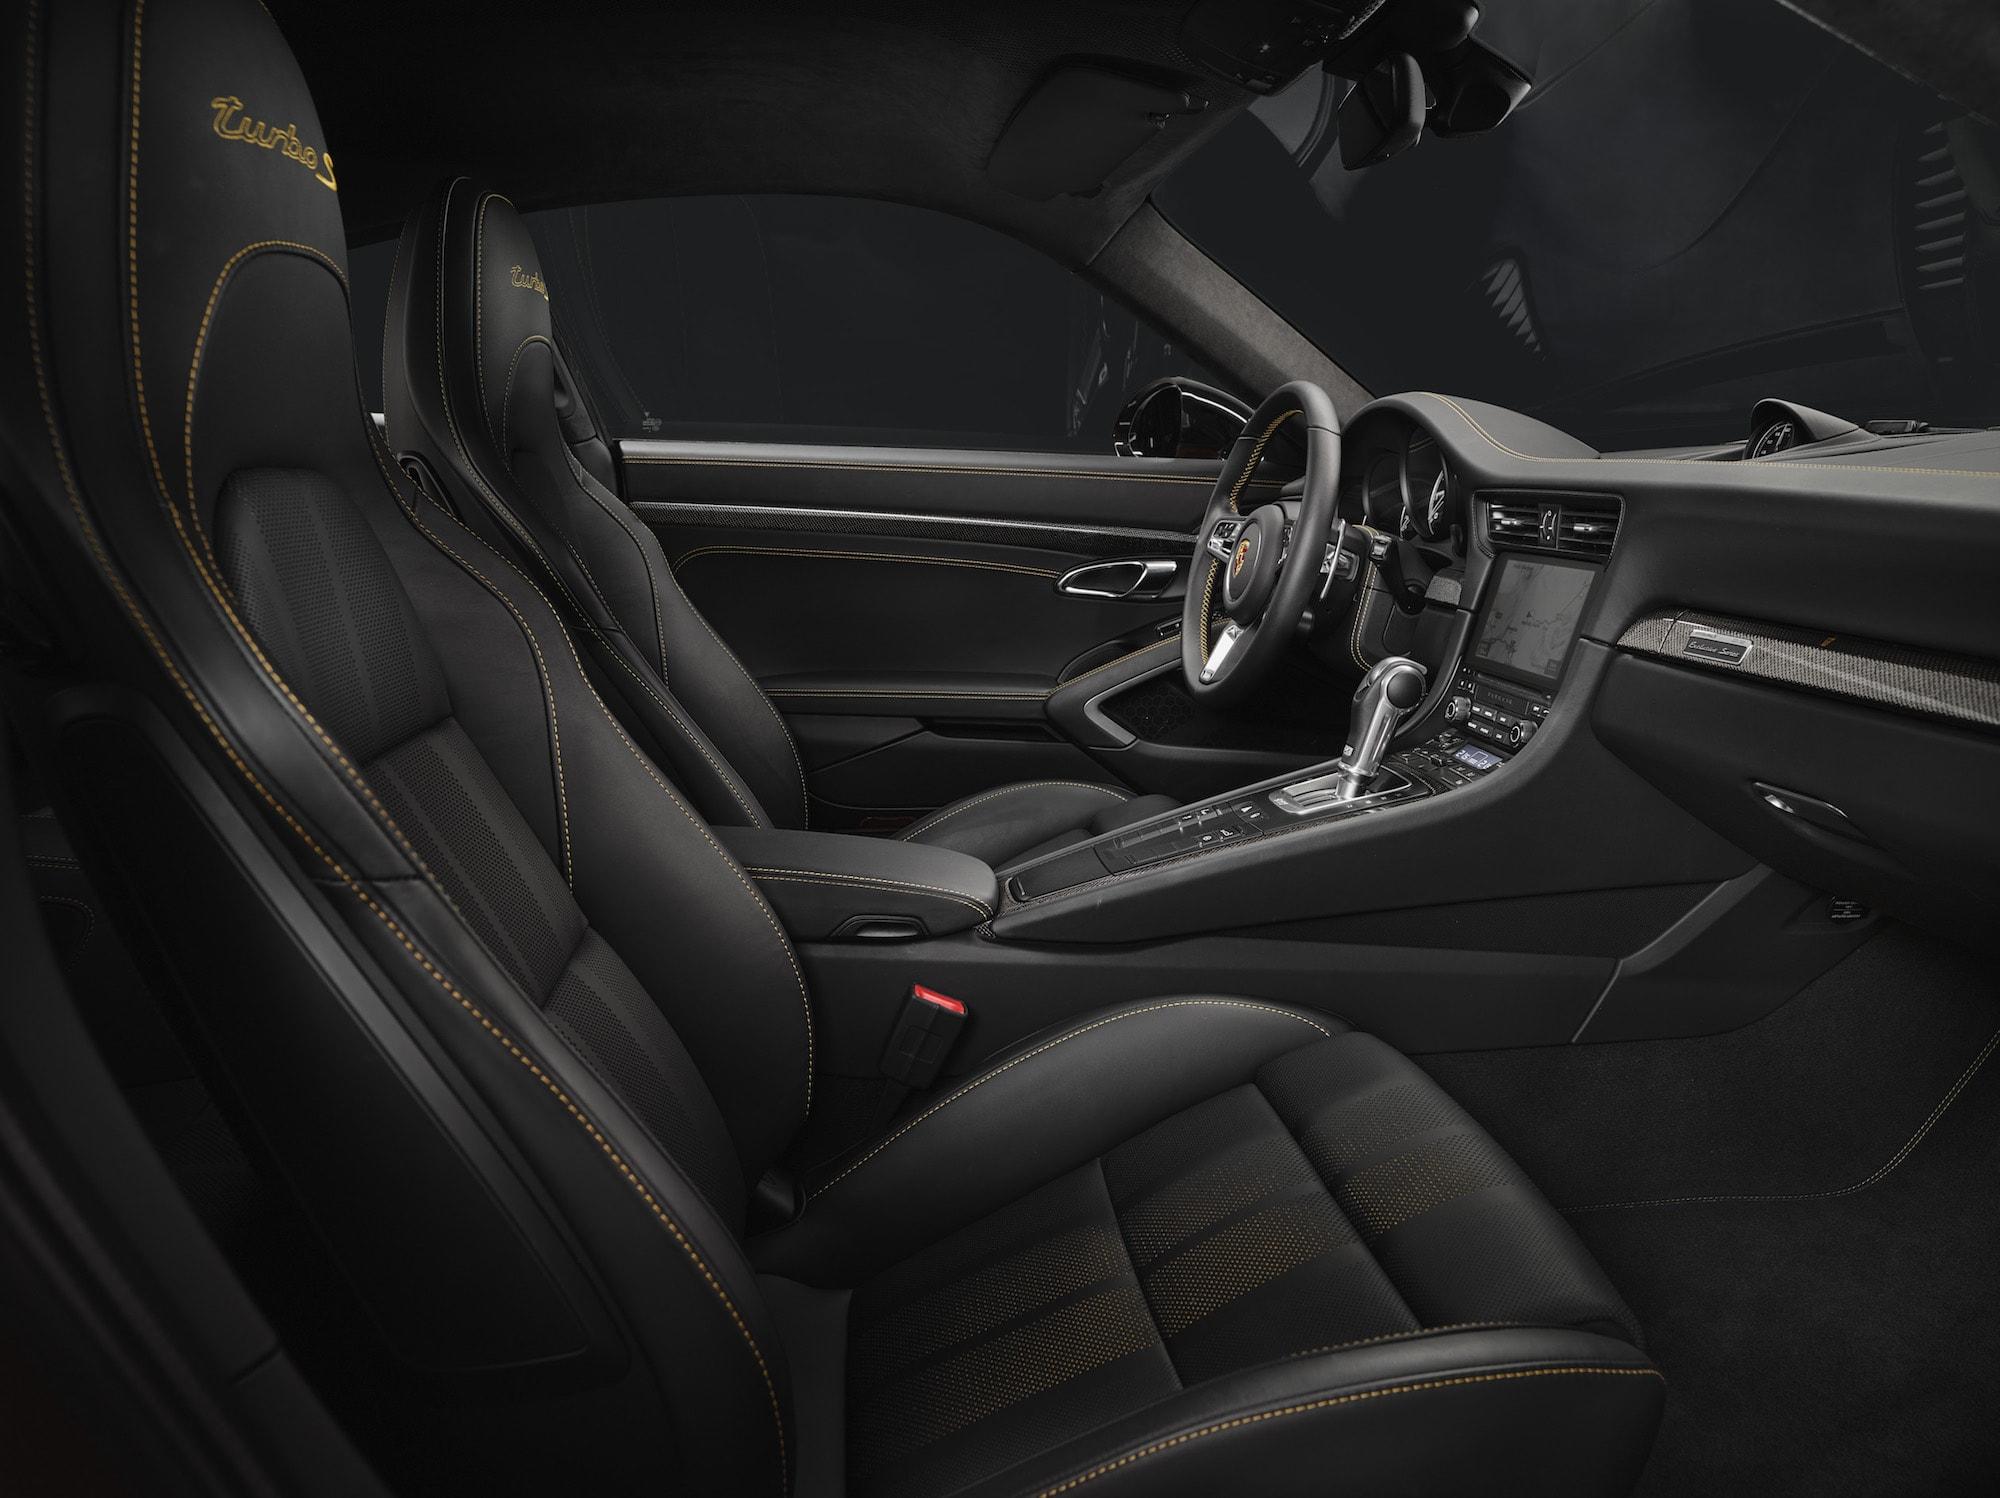 Echt goldig: Der Neue 911 Turbo S Exclusive Series 5